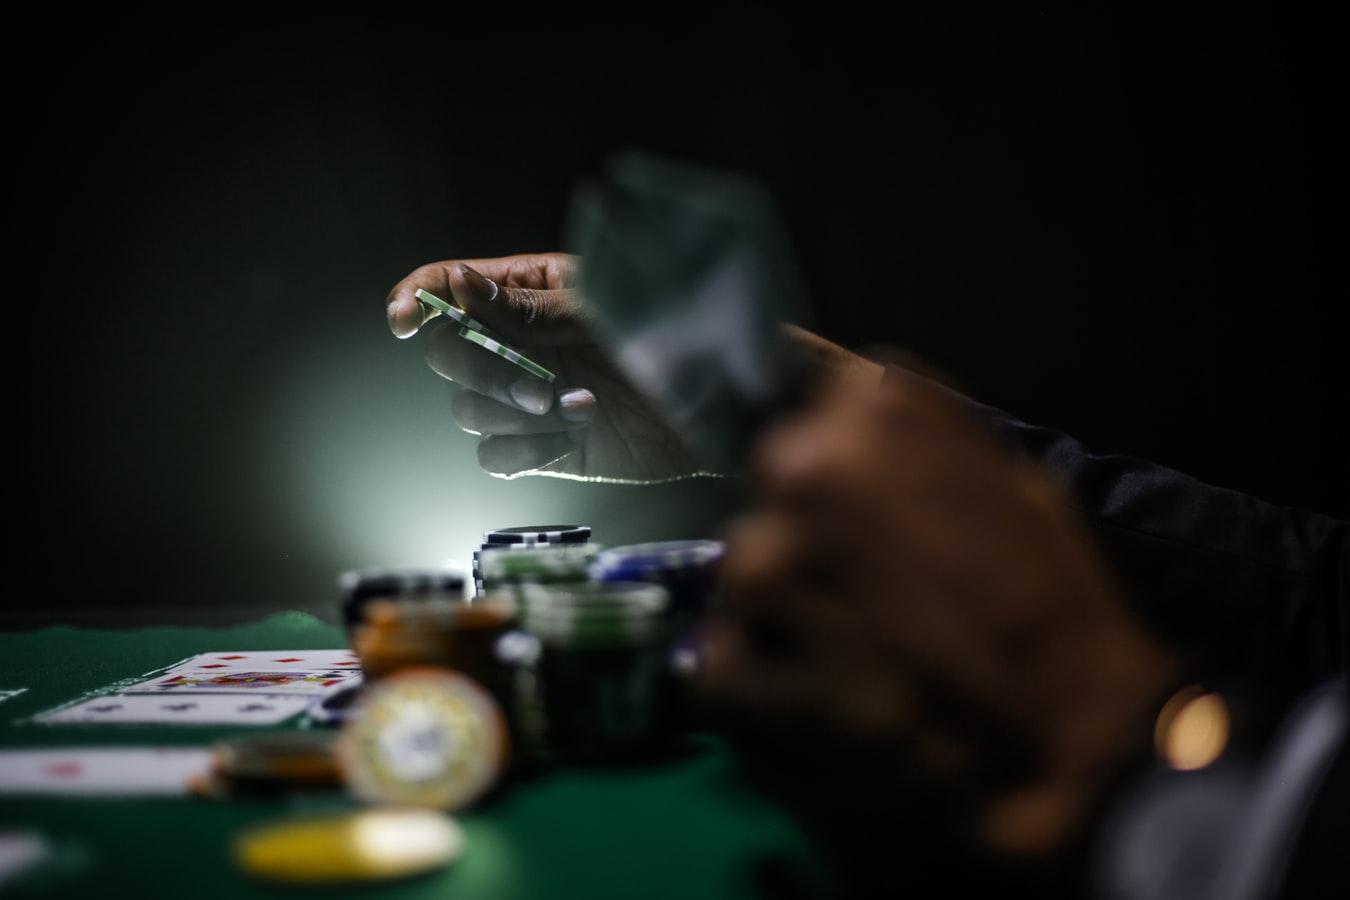 Thailand Vs Asia: Gambling Laws Comparison - Thailand Business News